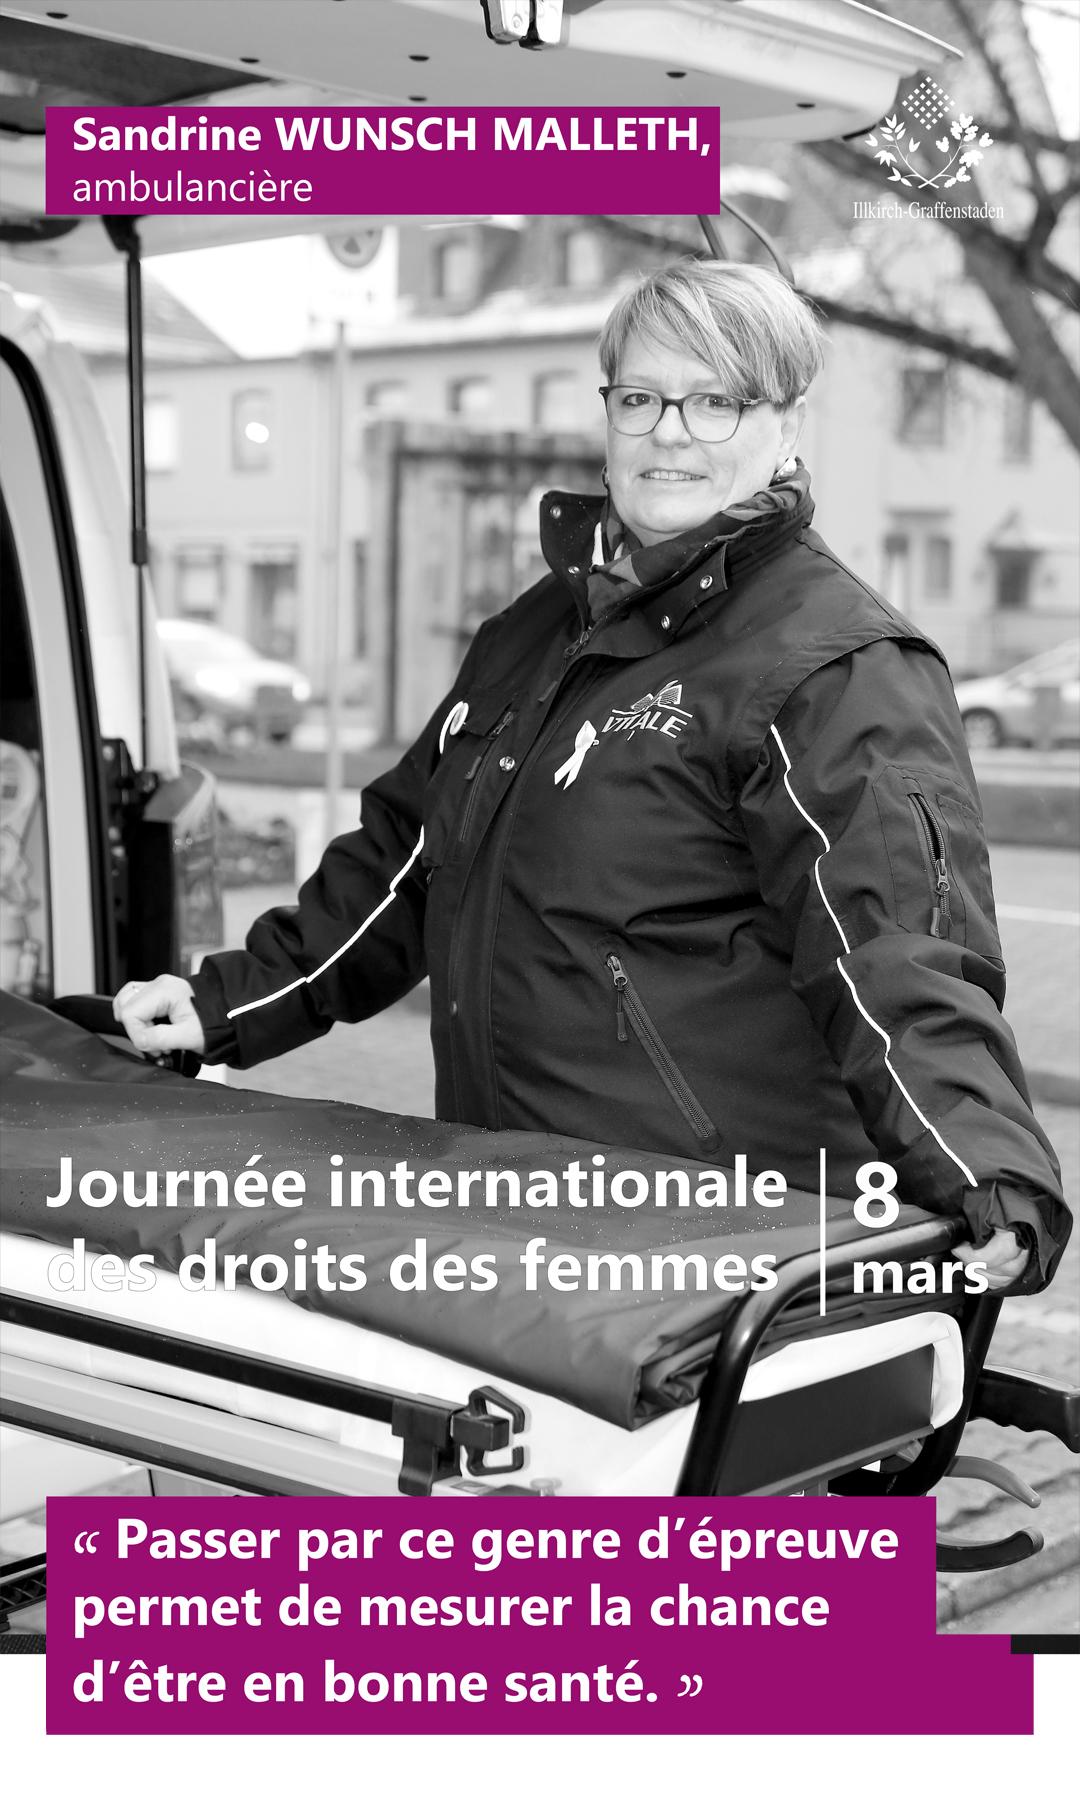 Sandrine Wunsch Malleth - Journée internationale des droits des femmes